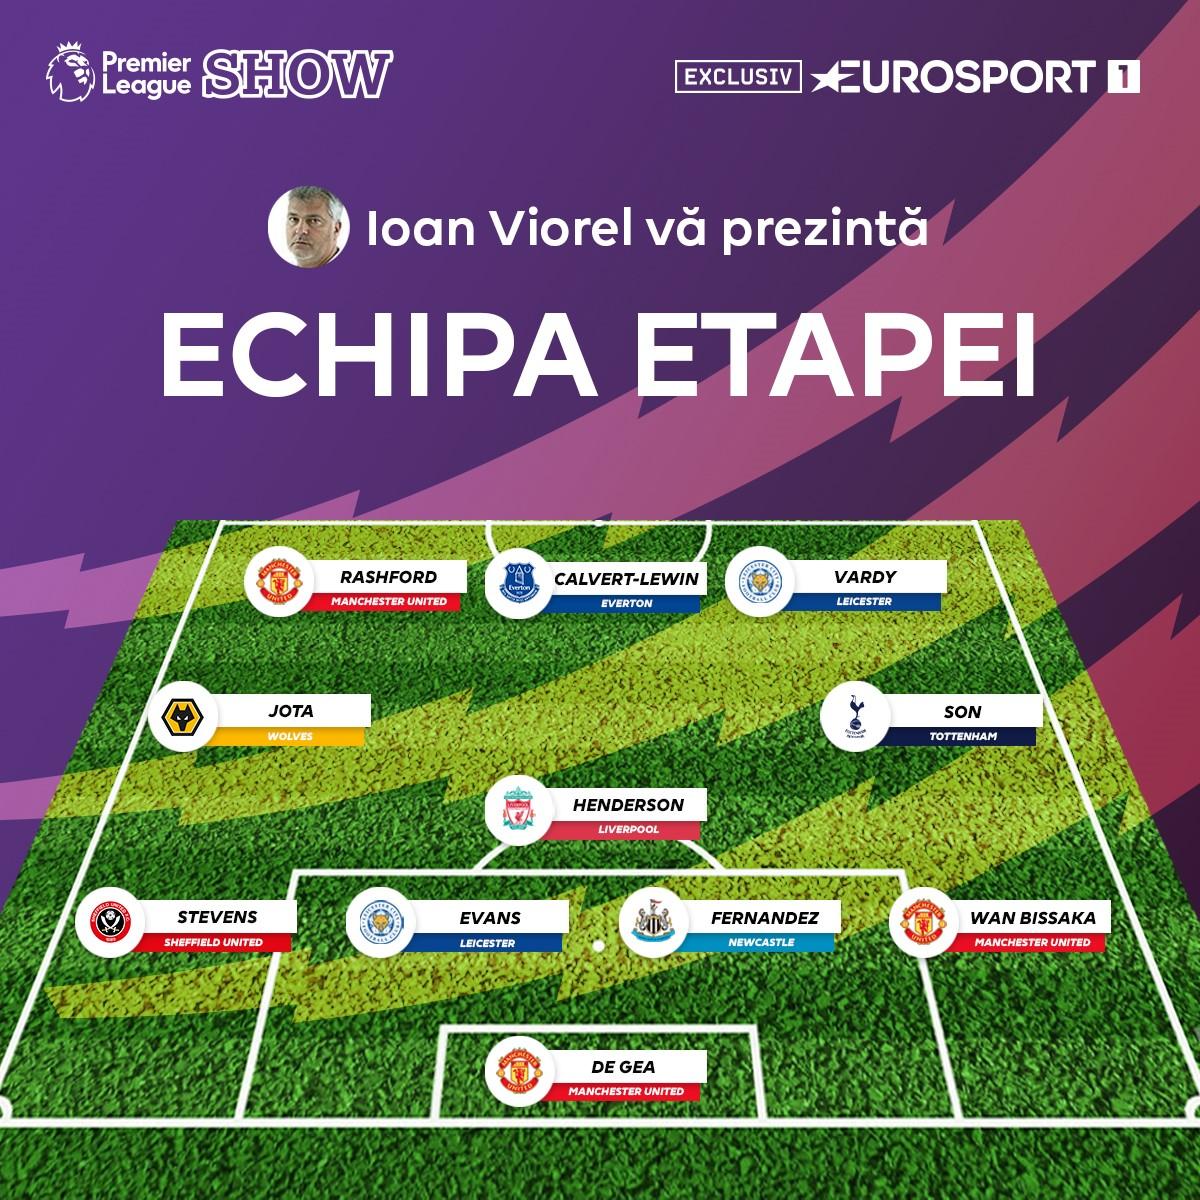 https://i.eurosport.com/2019/12/11/2734365.jpg